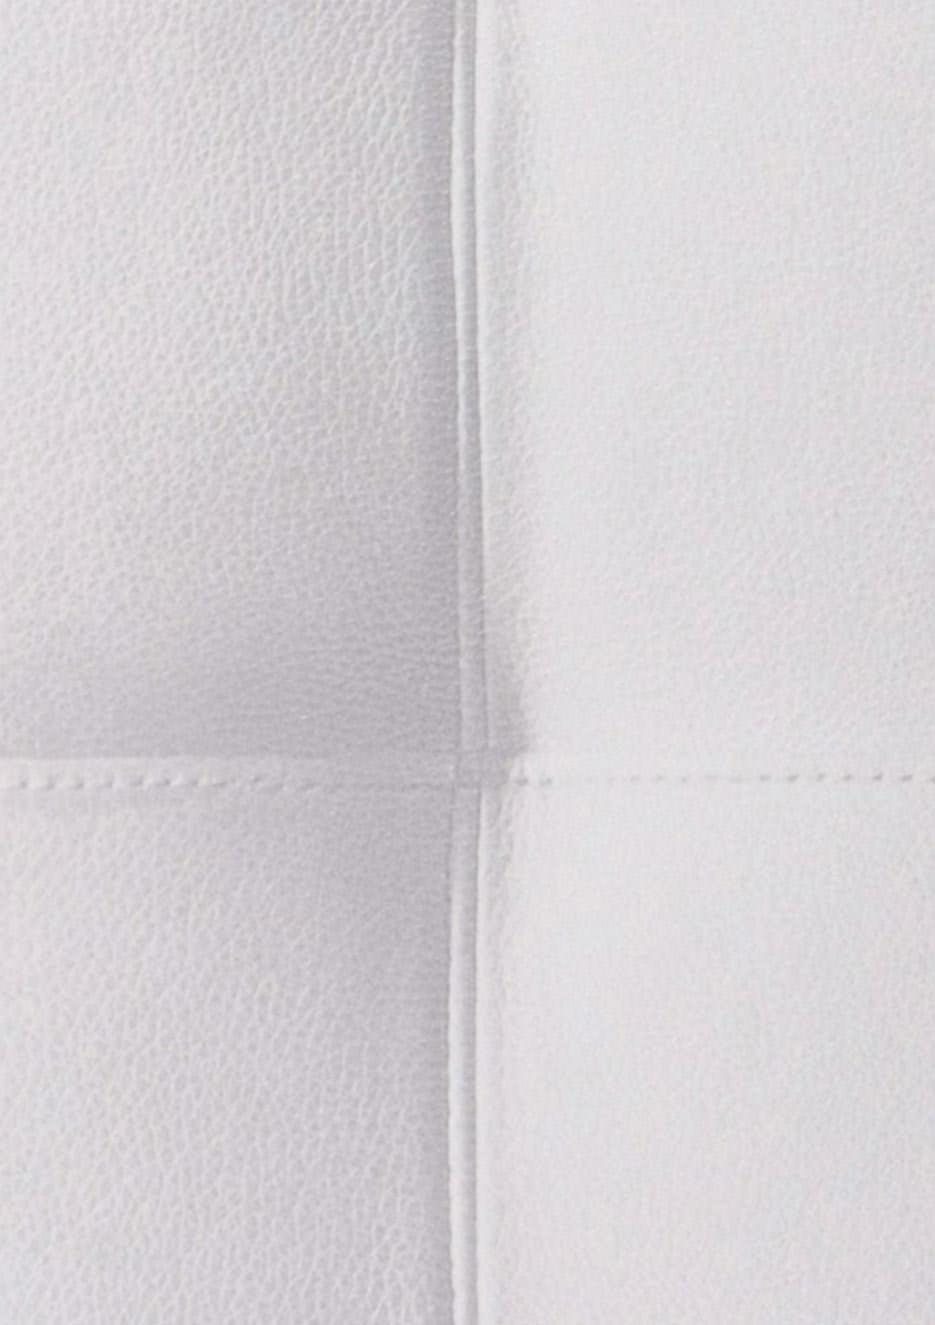 Papel pintado kadmos blanco crema gris platino - Papel pintado de los 70 ...